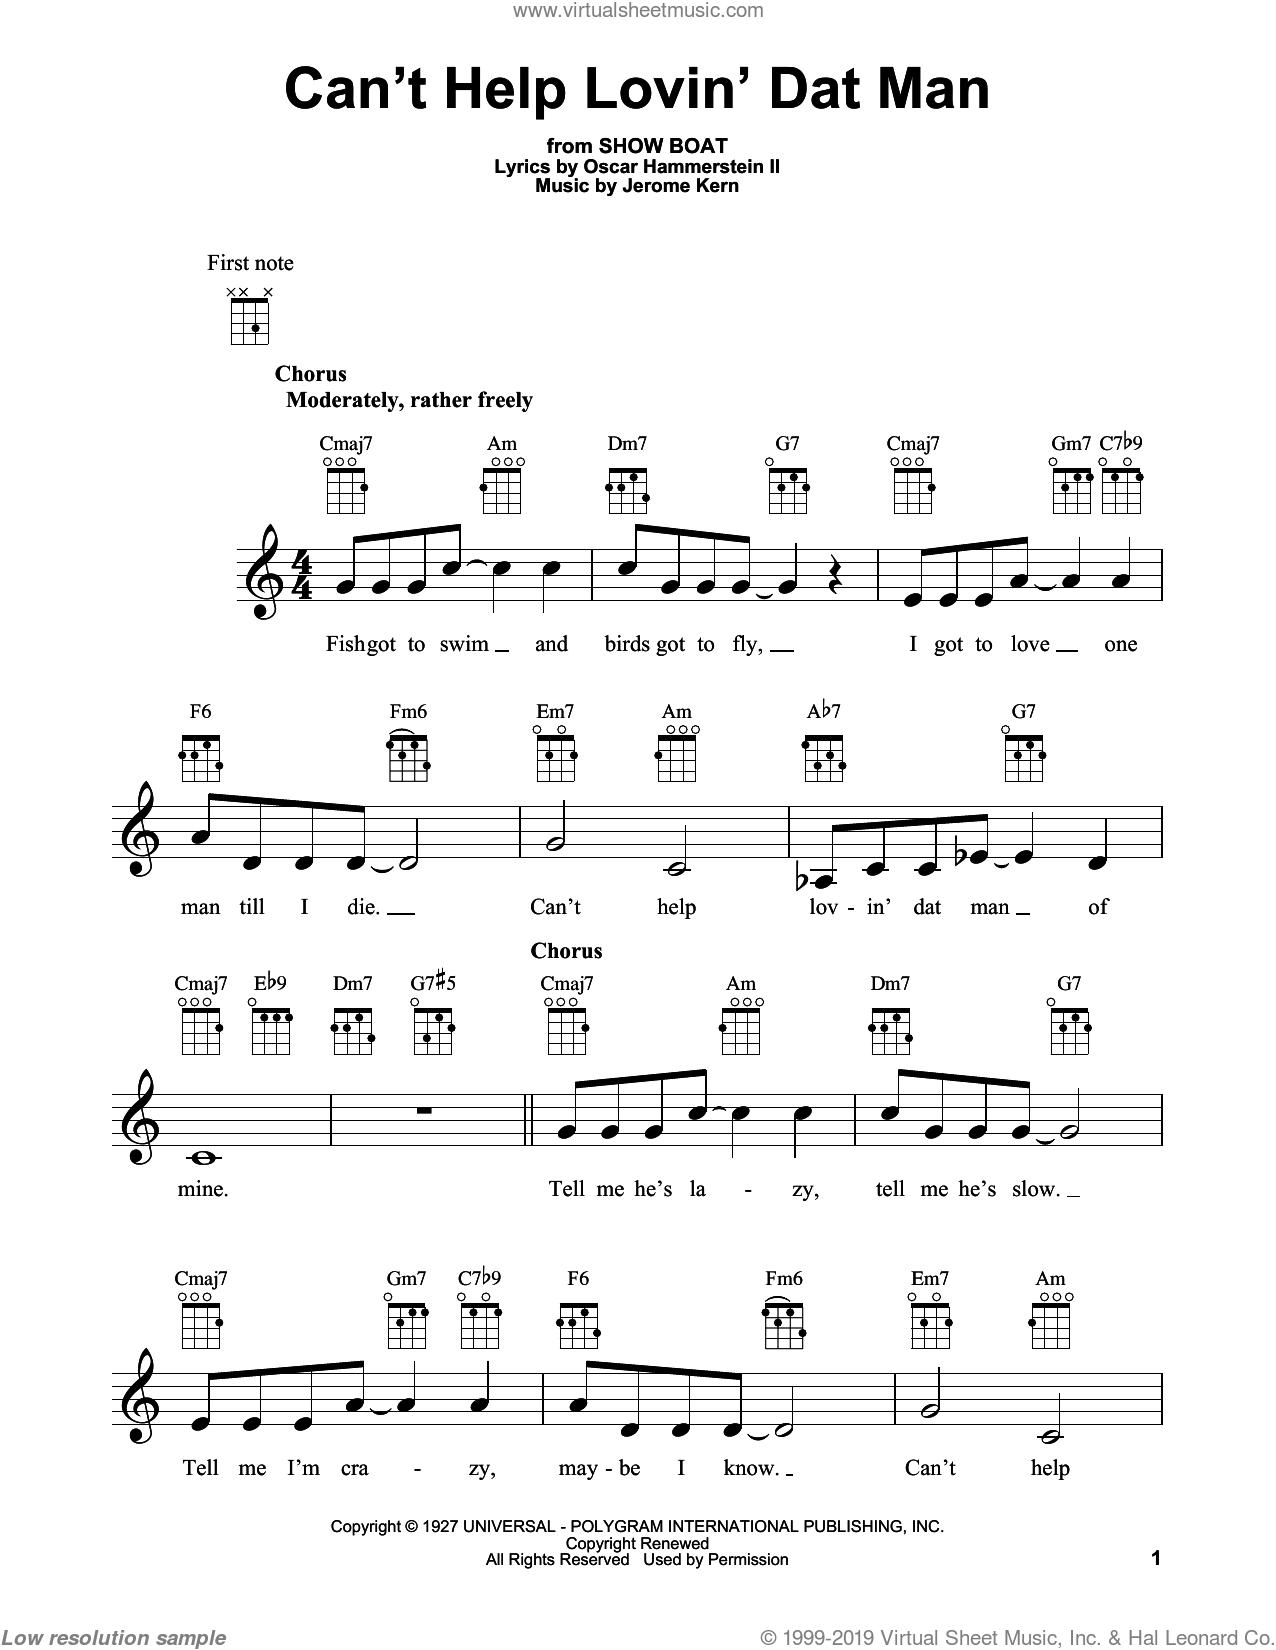 Can't Help Lovin' Dat Man sheet music for ukulele by Jerome Kern, Show Boat (Musical) and Oscar II Hammerstein, intermediate skill level